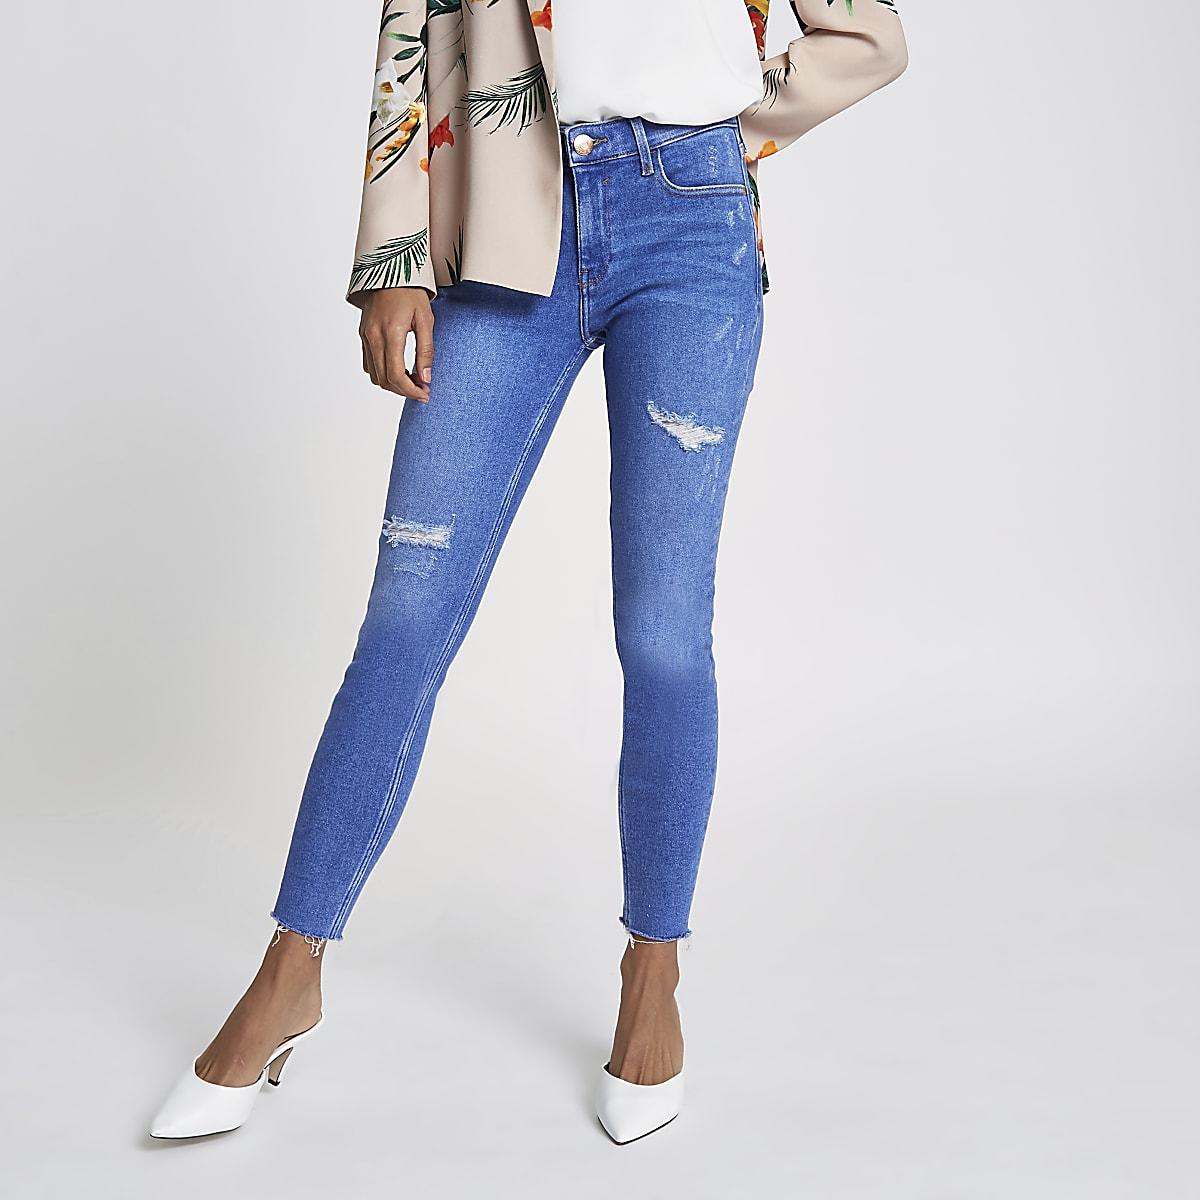 3cd6edd5766fbc Petite – Amelie – Blaue Super Skinny Jeans im Used-Look - Skinny ...